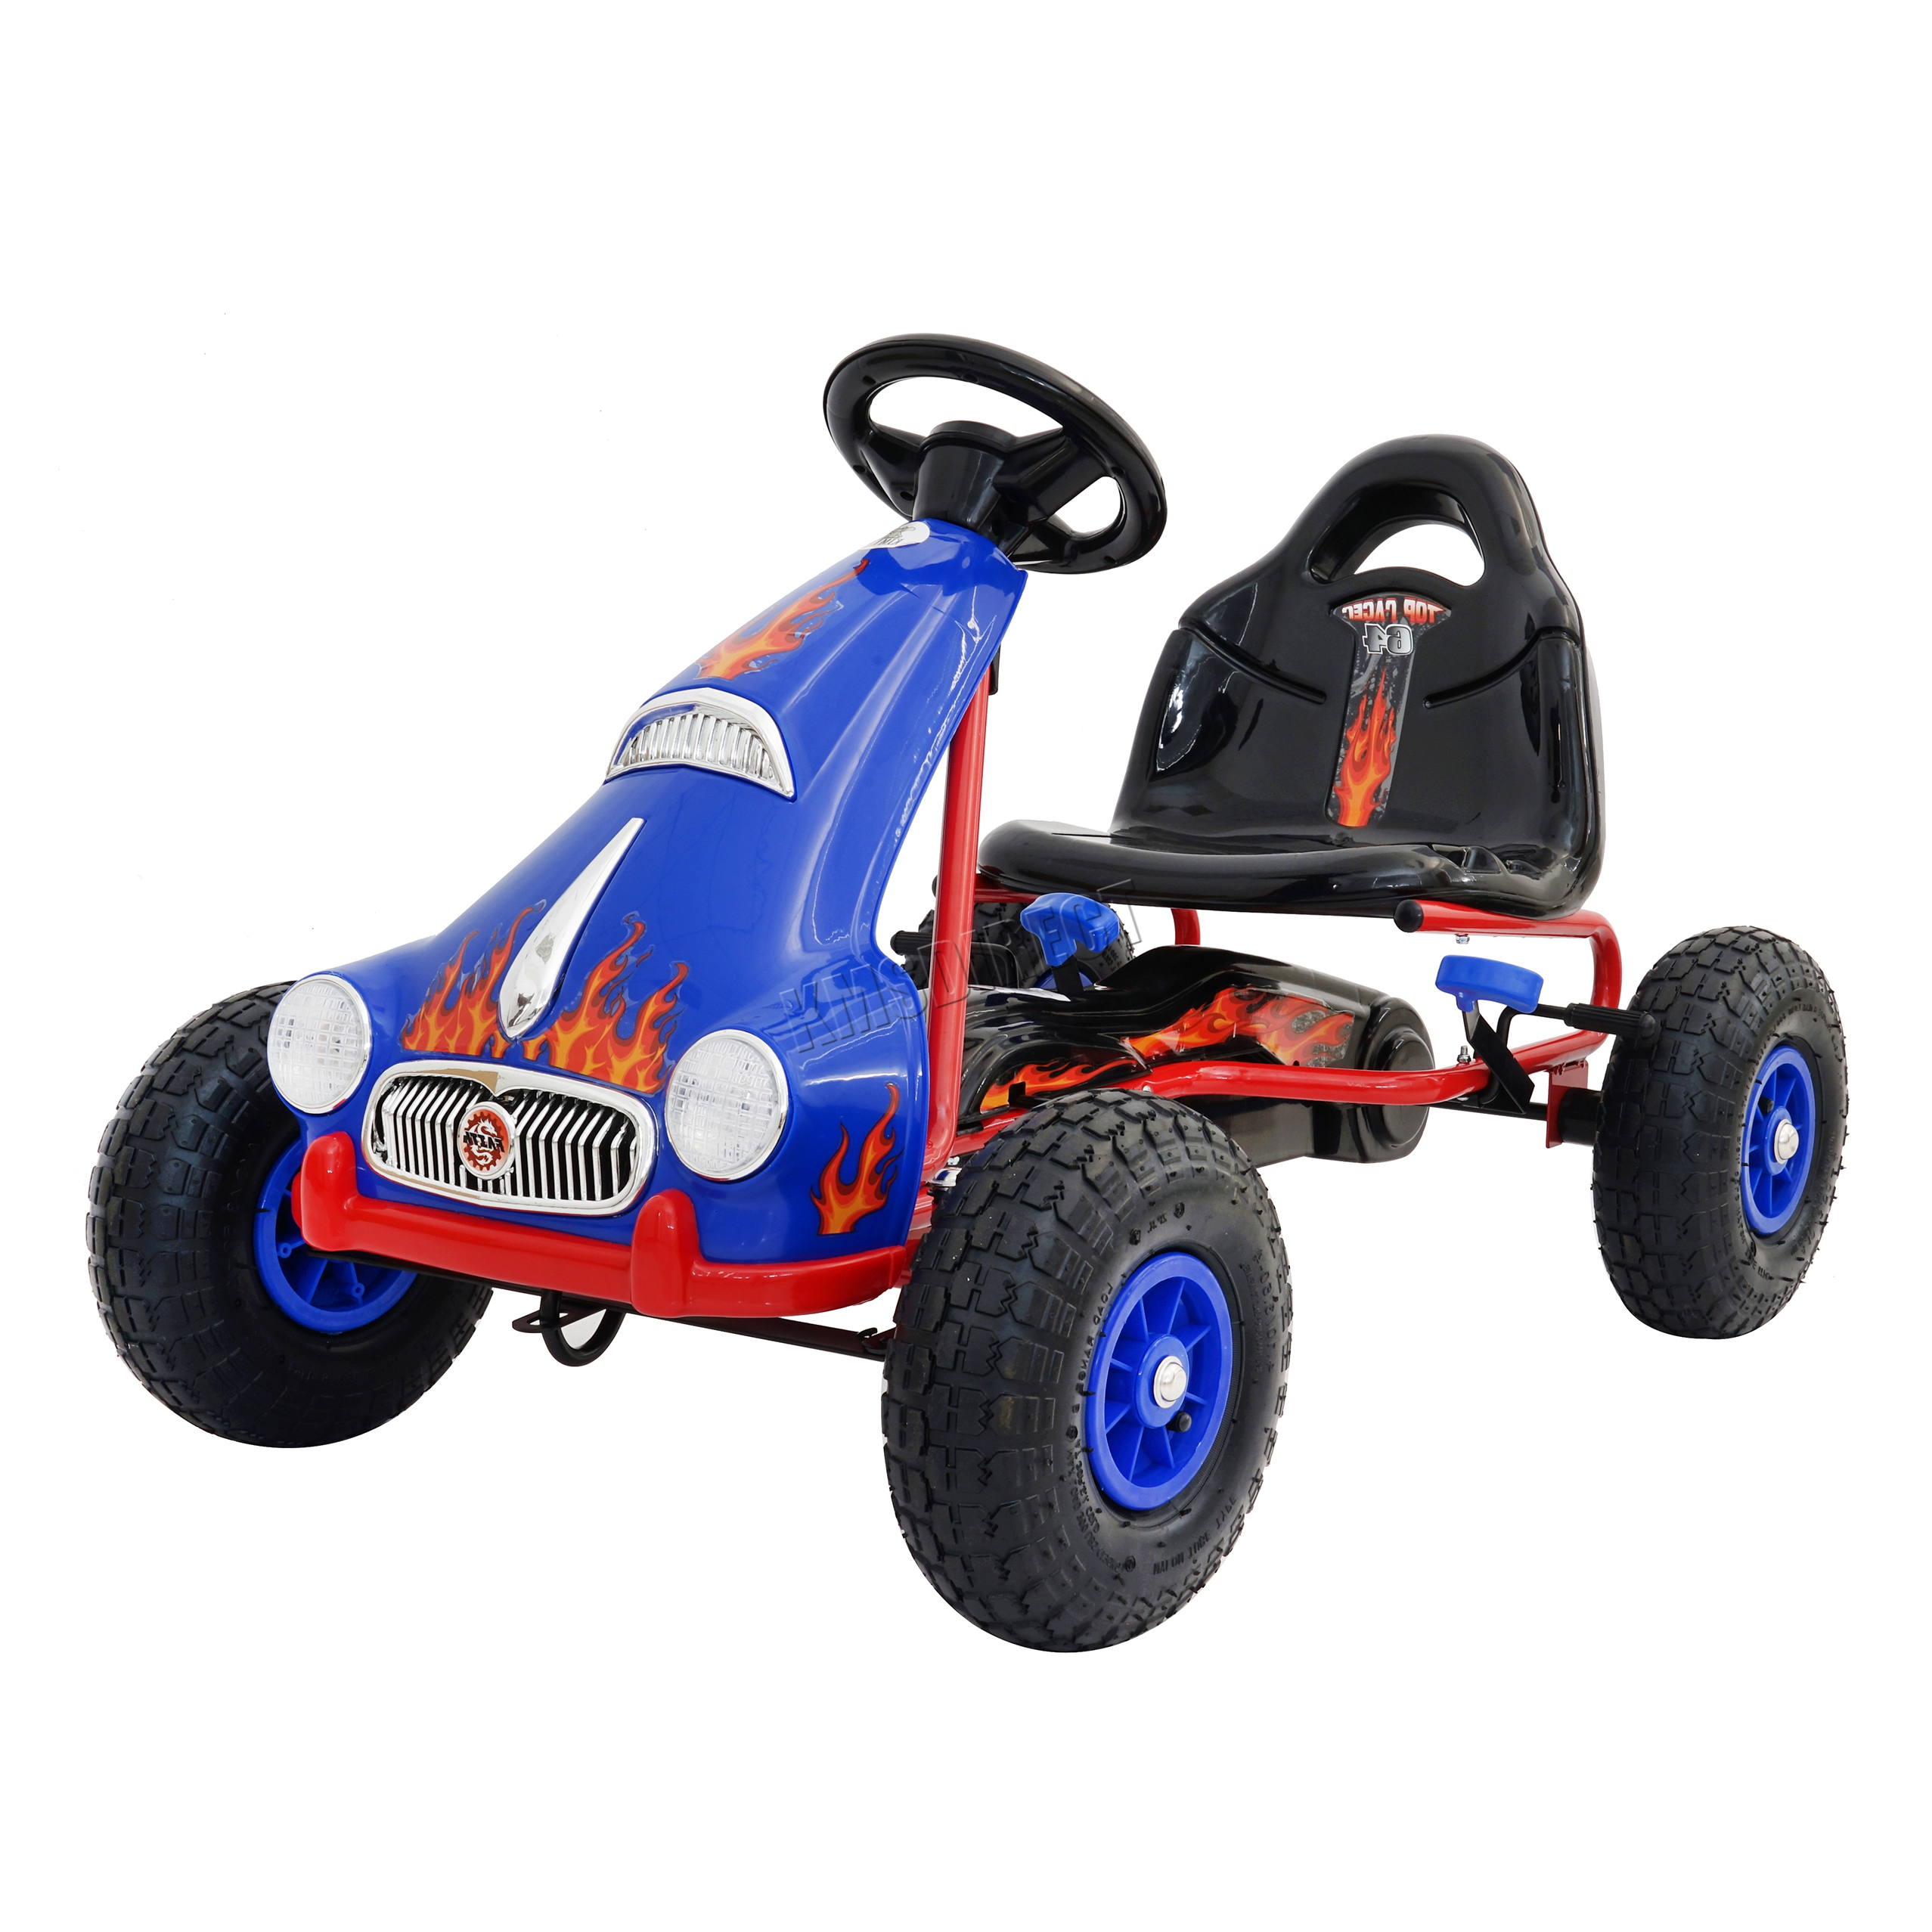 Foxhunter Niños Go Kart Correpasillos Coche Pedal ruedas FRENO DE ...